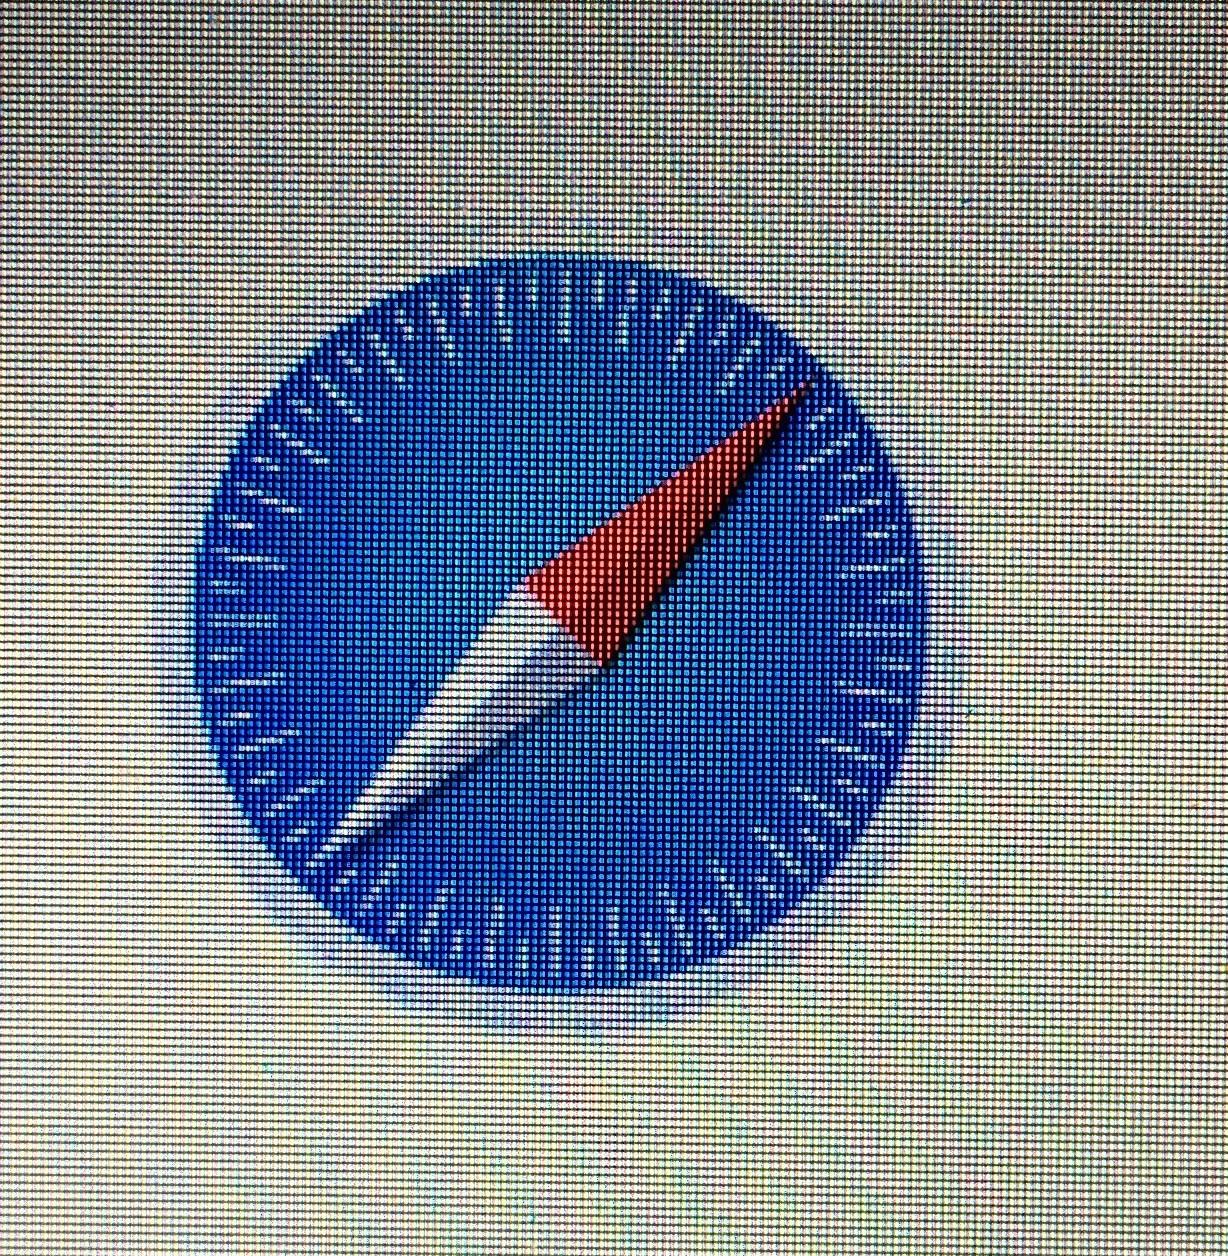 iPhoneの標準ブラウザSafari – ブックマーク、お気に入りの使い方/アイフォン,サファリ